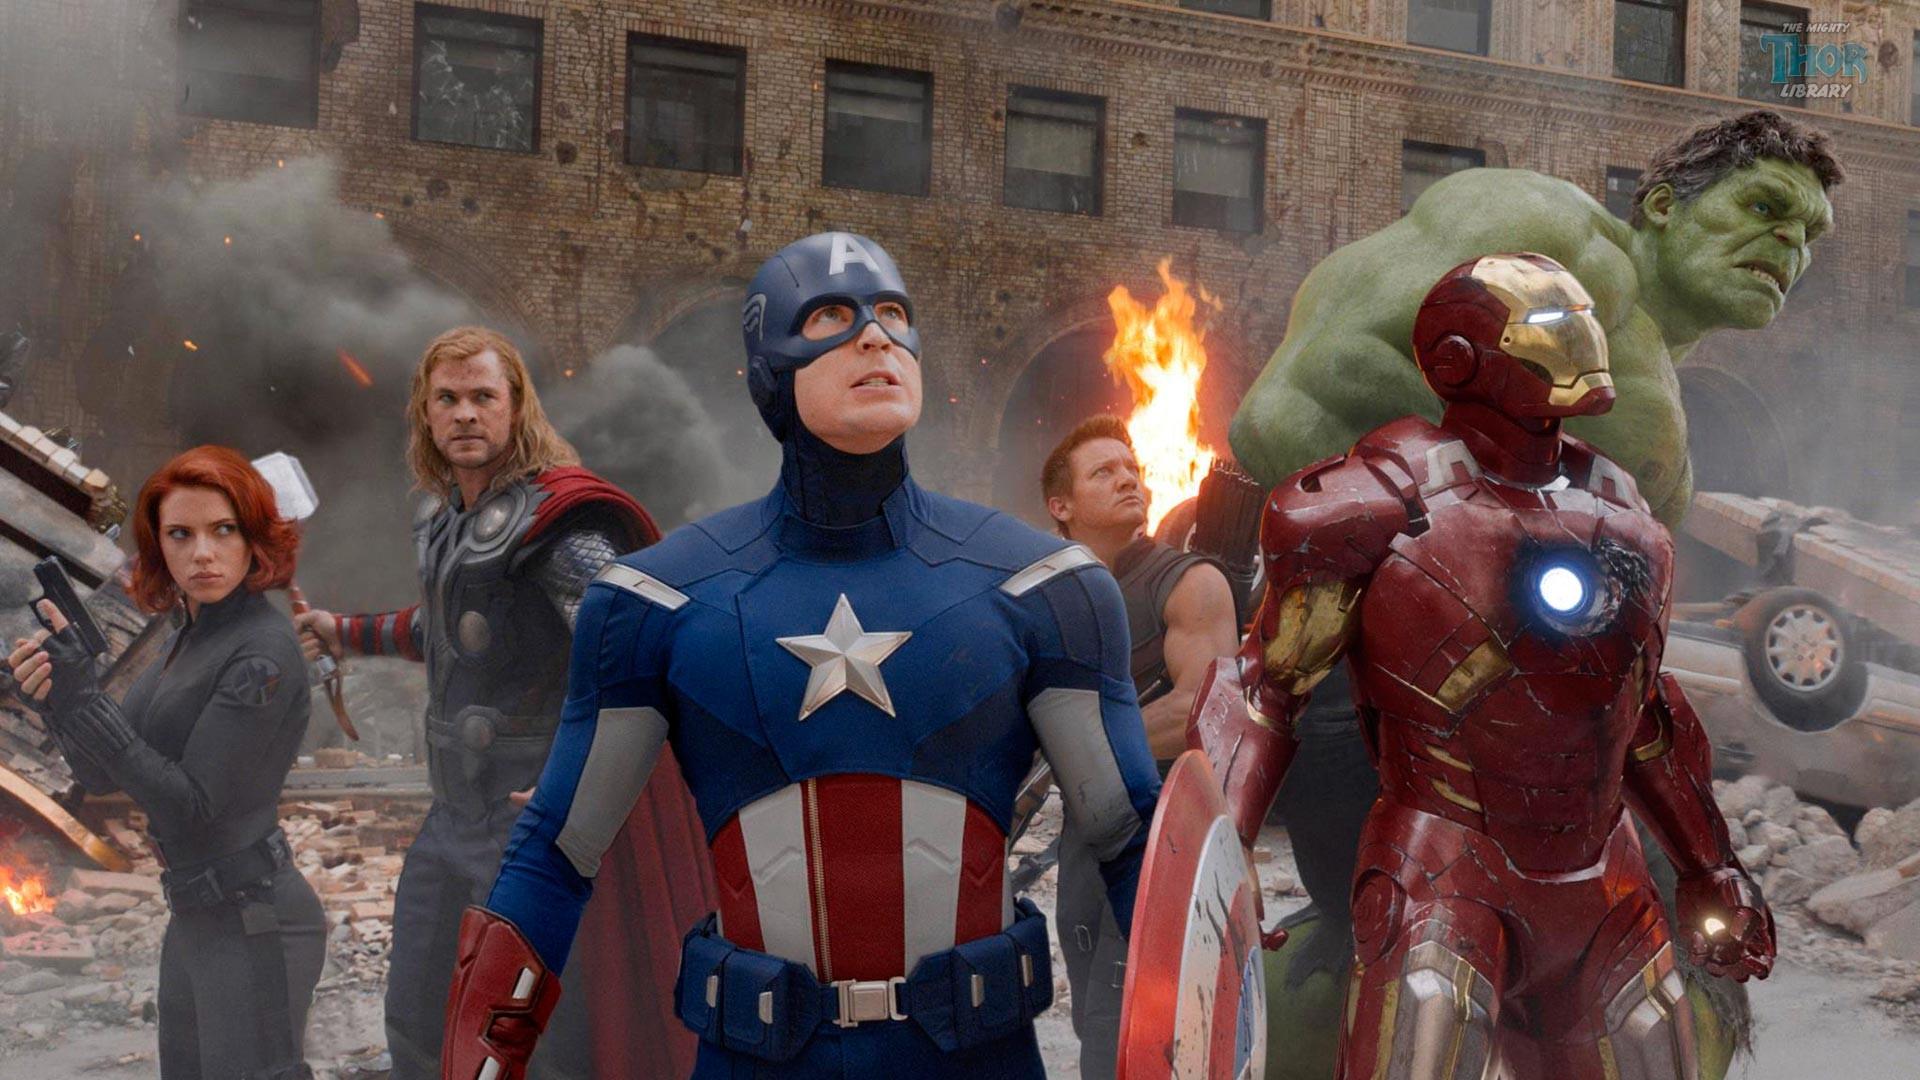 Avengers Assemble in Movie (1920 x 1080) wallpaper